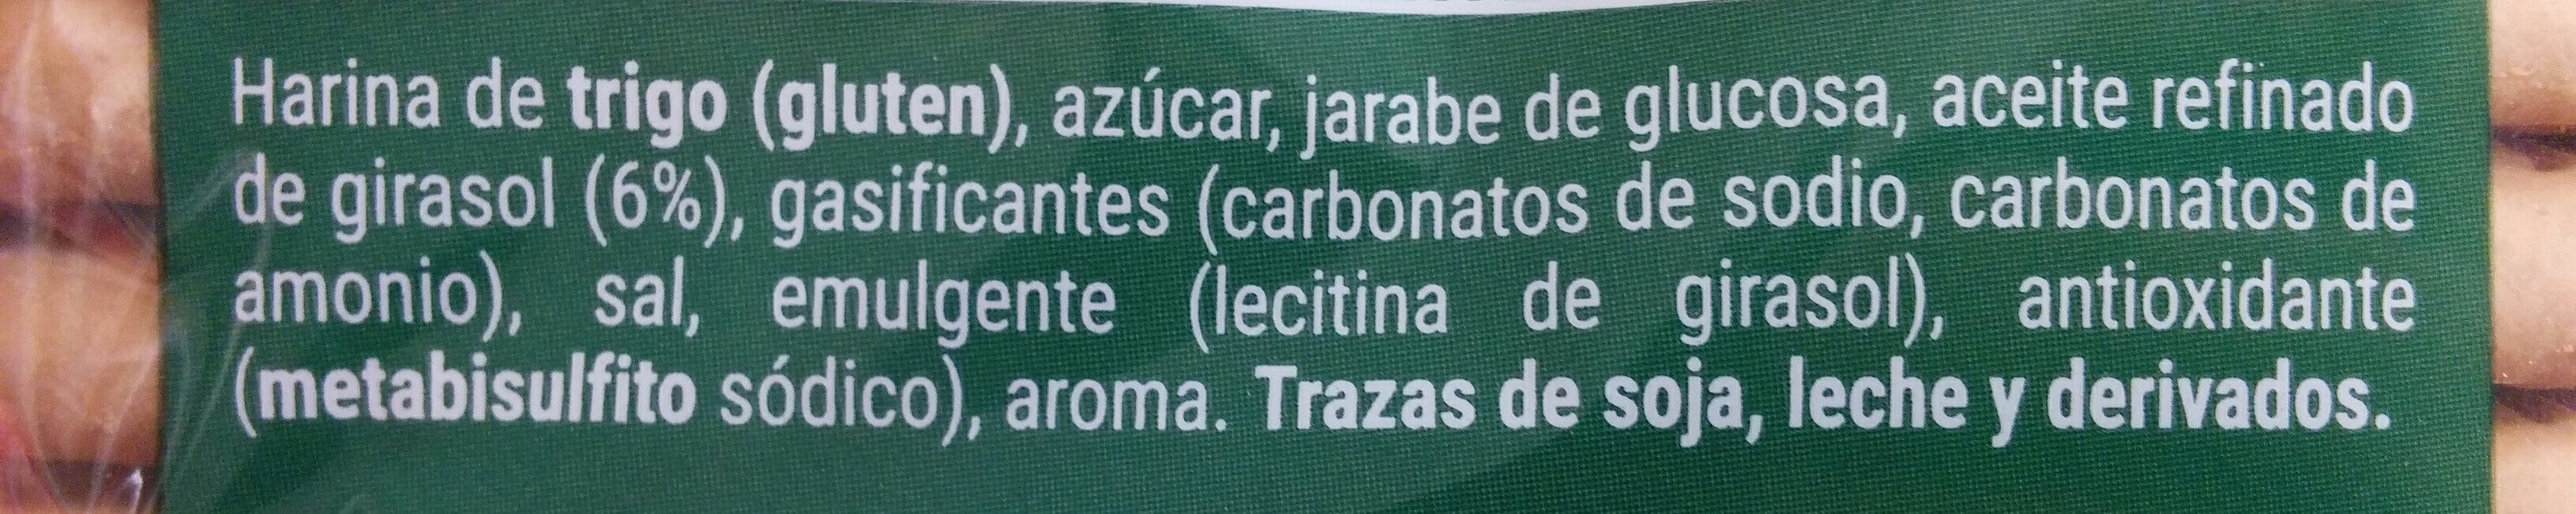 Galleta hojaldrada - Ingredienti - es